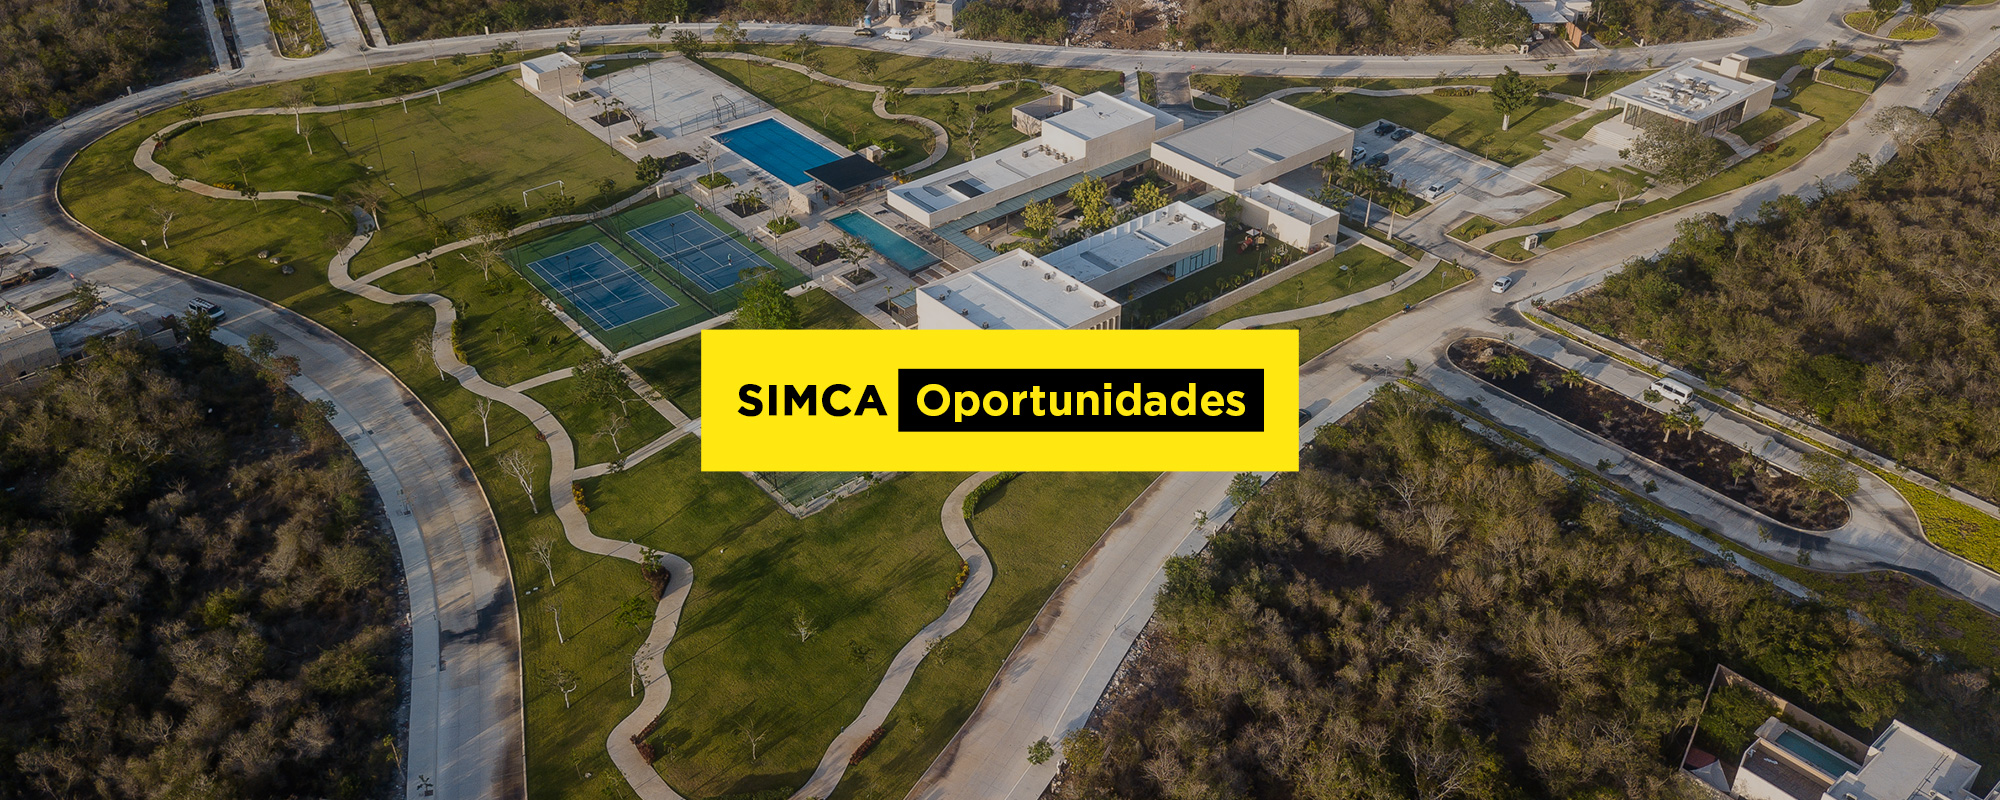 simca-oportunidades-slider-merida-gral